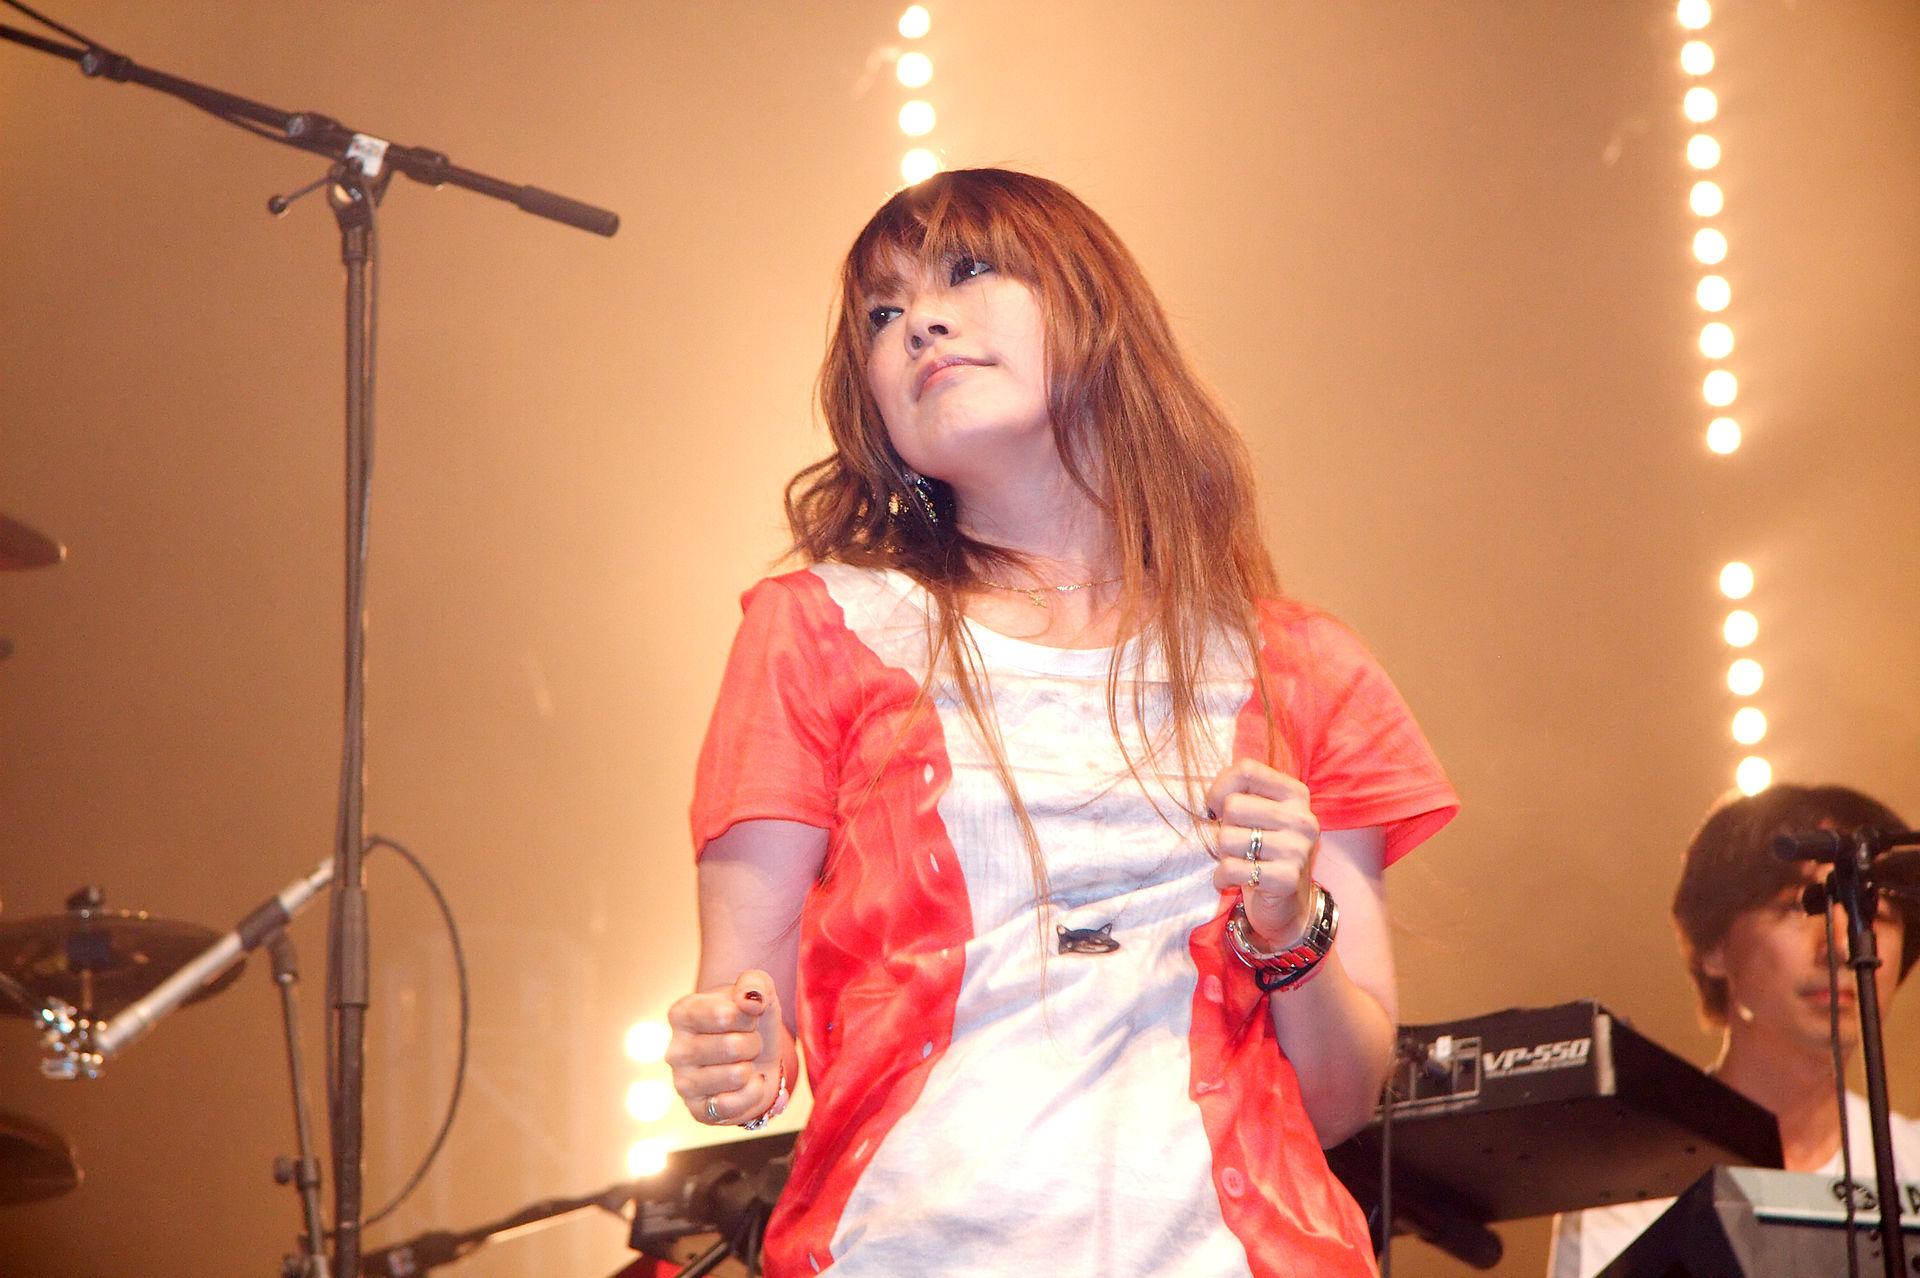 Ami Onuki - Wikipedia